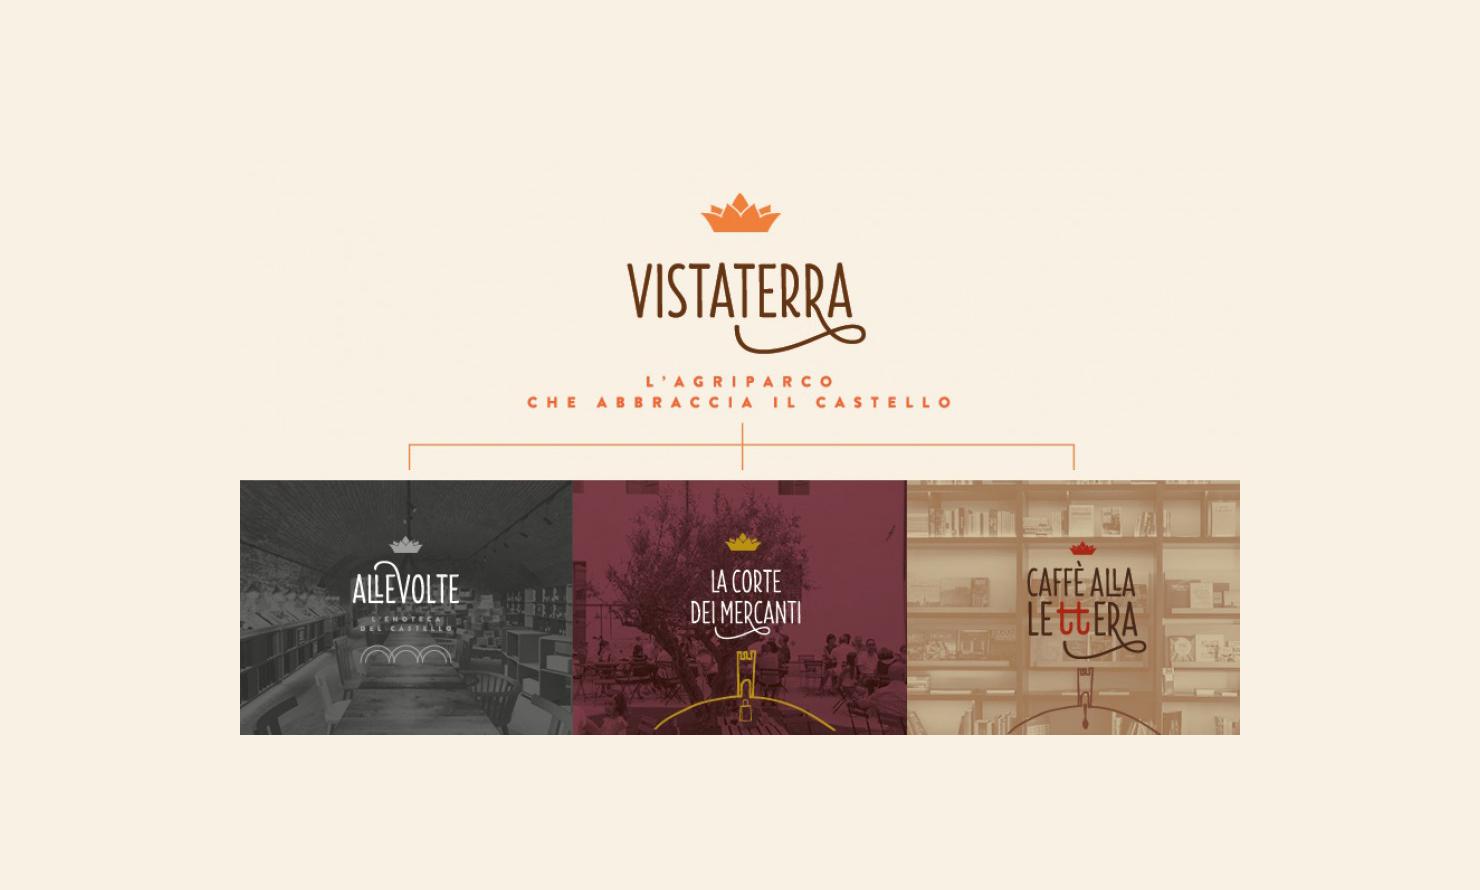 https://www.kubelibre.com/uploads/Slider-work-tutti-clienti/manital-vistaterra-l-agriparco-che-abbraccia-il-castello-brand-identity-brand-strategy-1.jpg